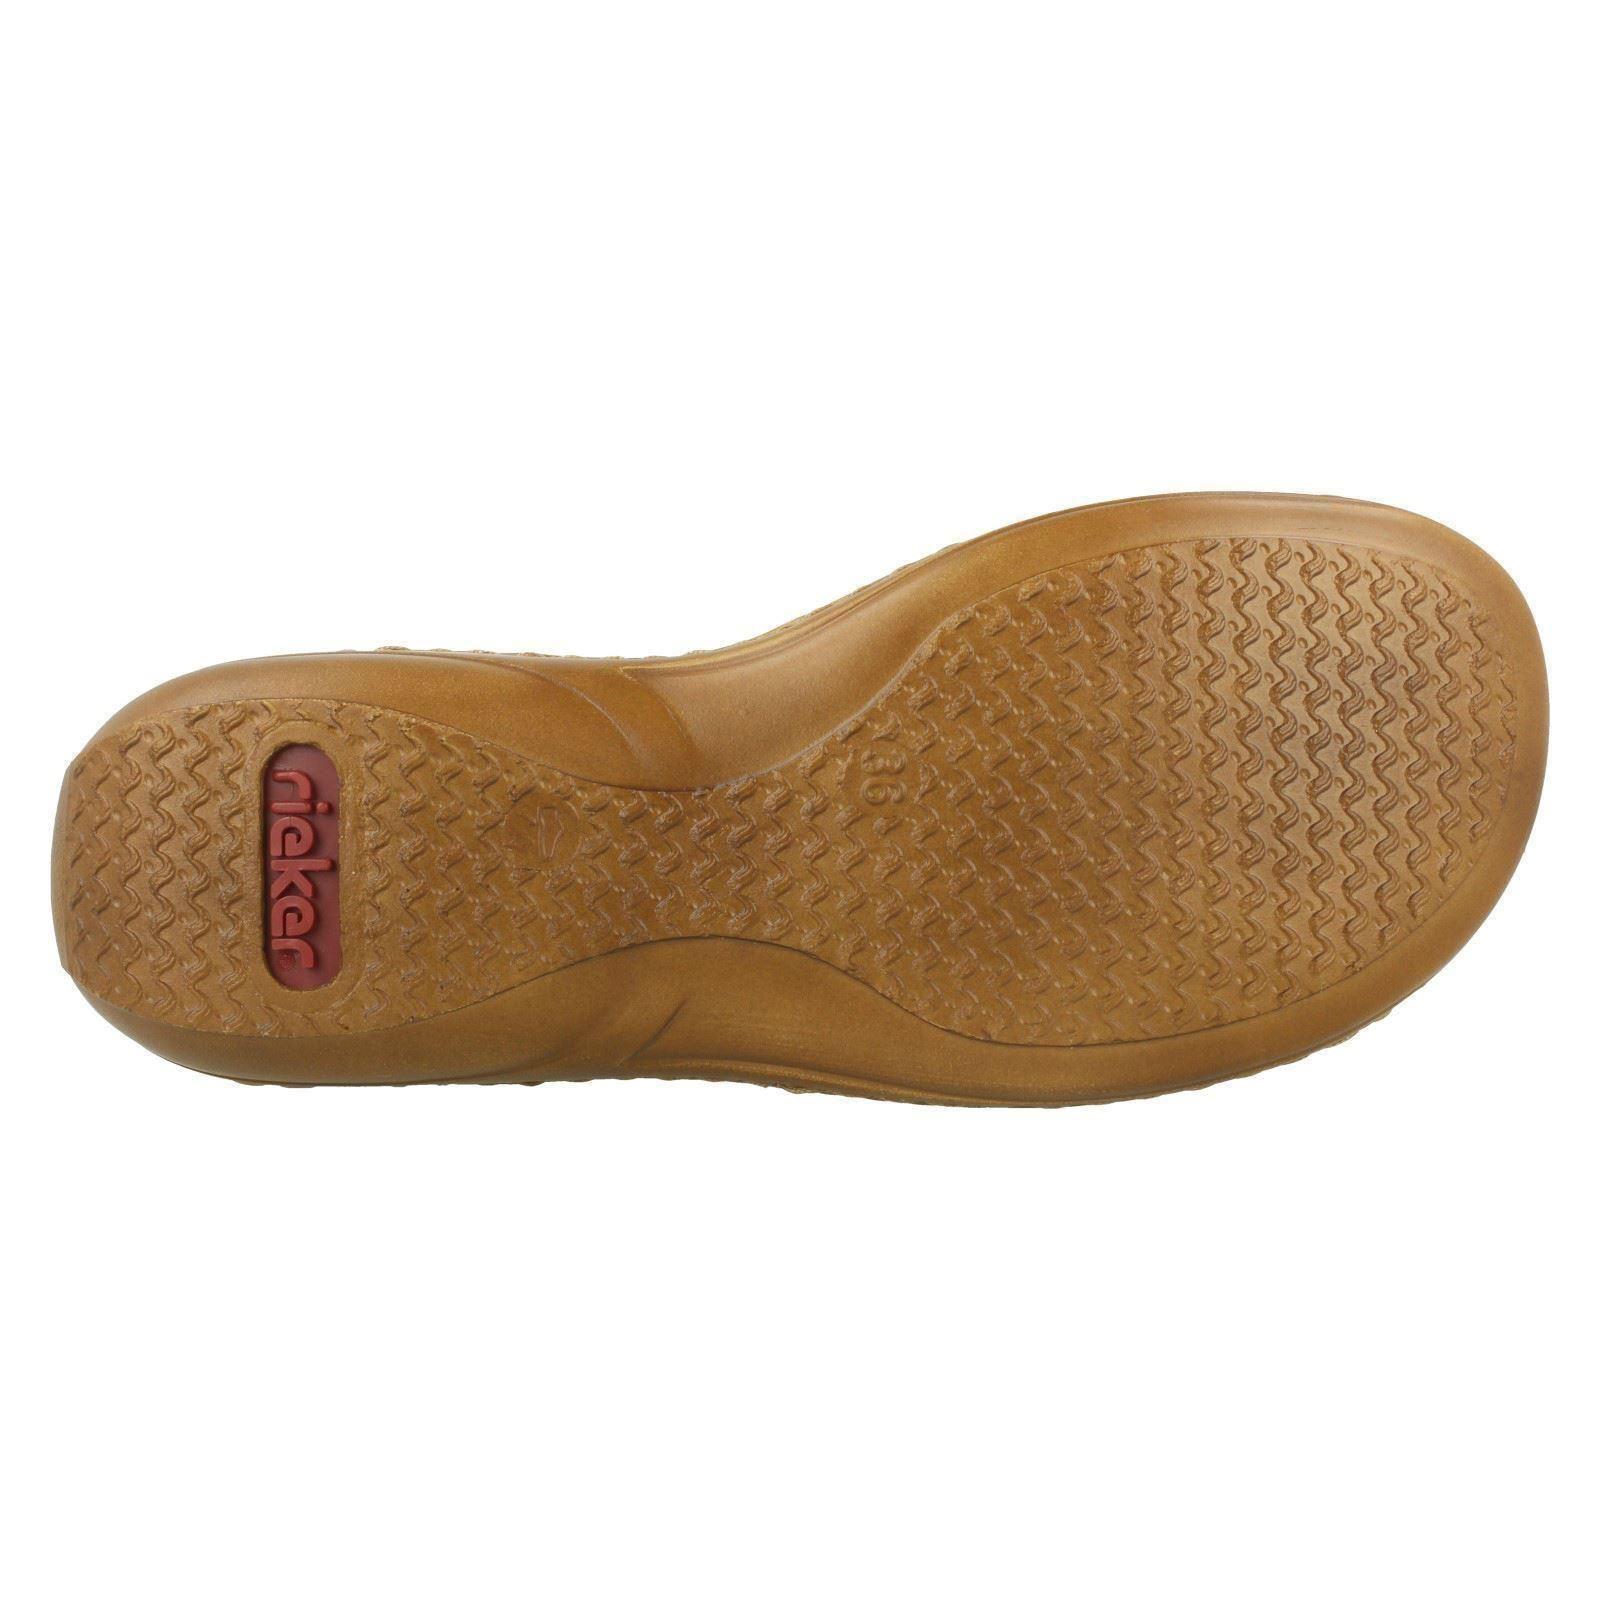 Ladies Rieker Casual Peep Toe Sandals '608D1' Blue